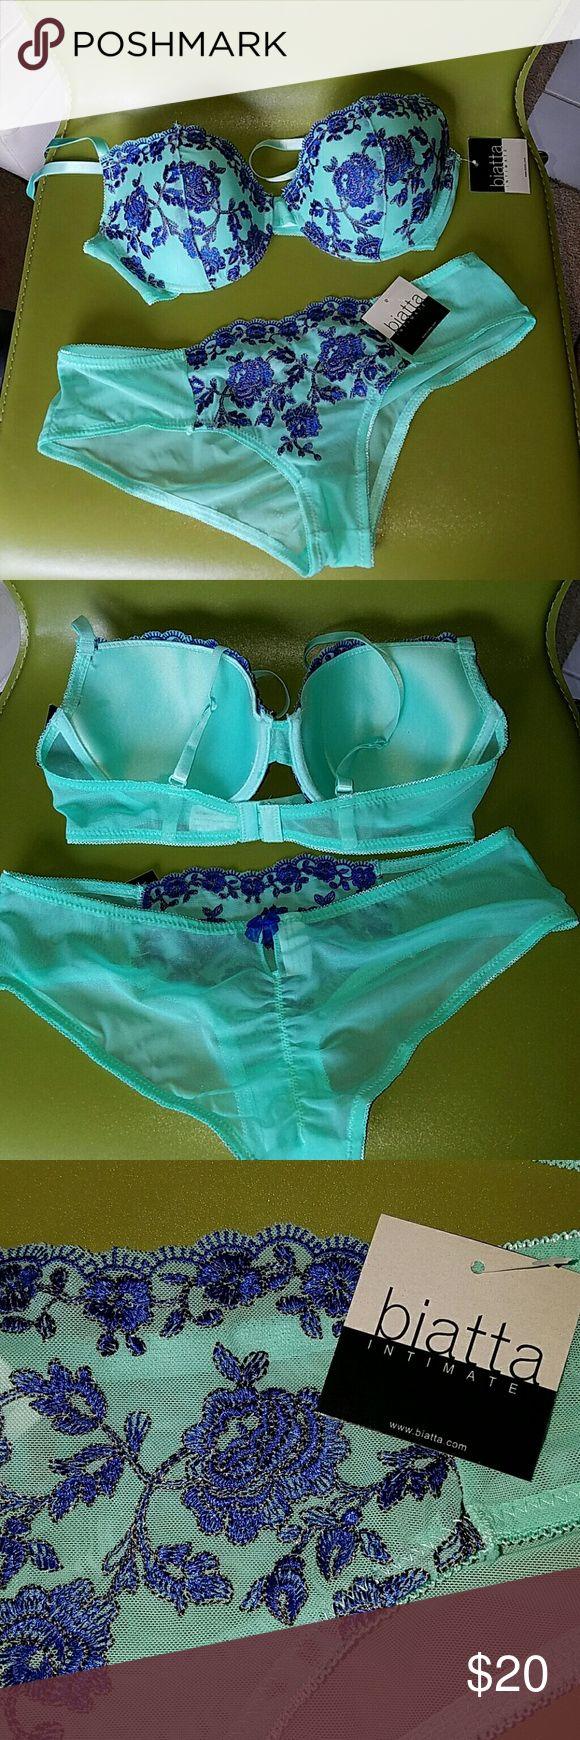 NWT Biatta Intimate Bra & Panty Set sz 36C/L NWT aqua and royal blue bra and panty set from Biatta. biatta Intimates & Sleepwear Bras